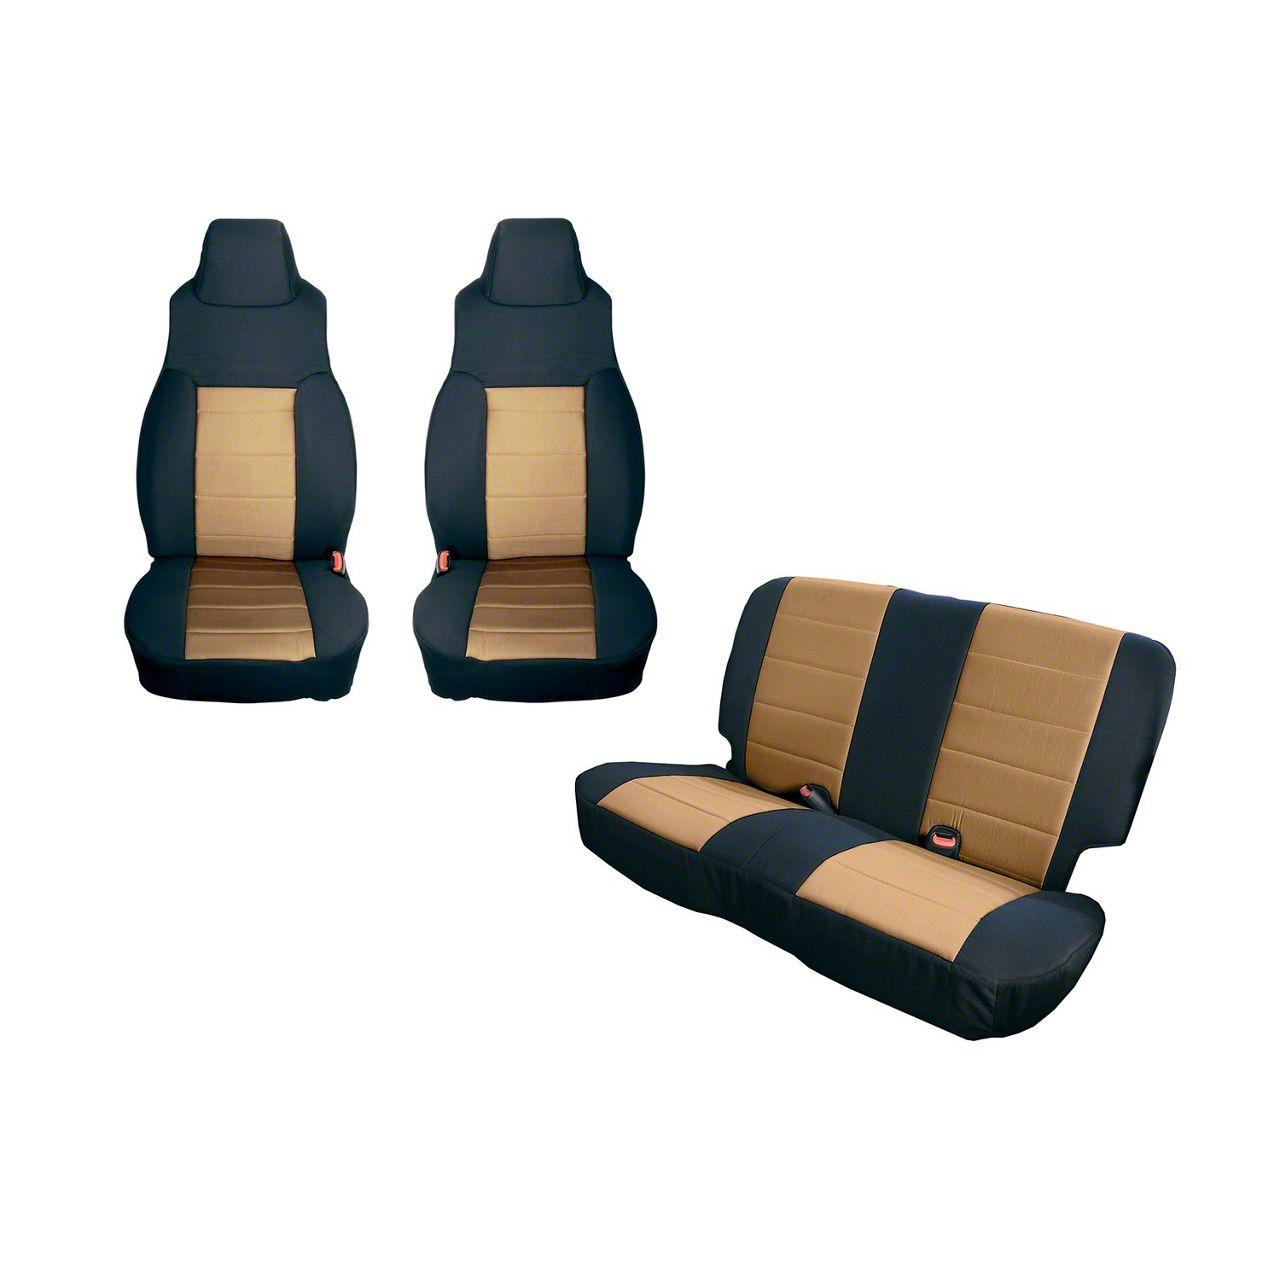 Rugged Ridge Seat Cover Kit - Black/Tan (91-95 Jeep Wrangler YJ)